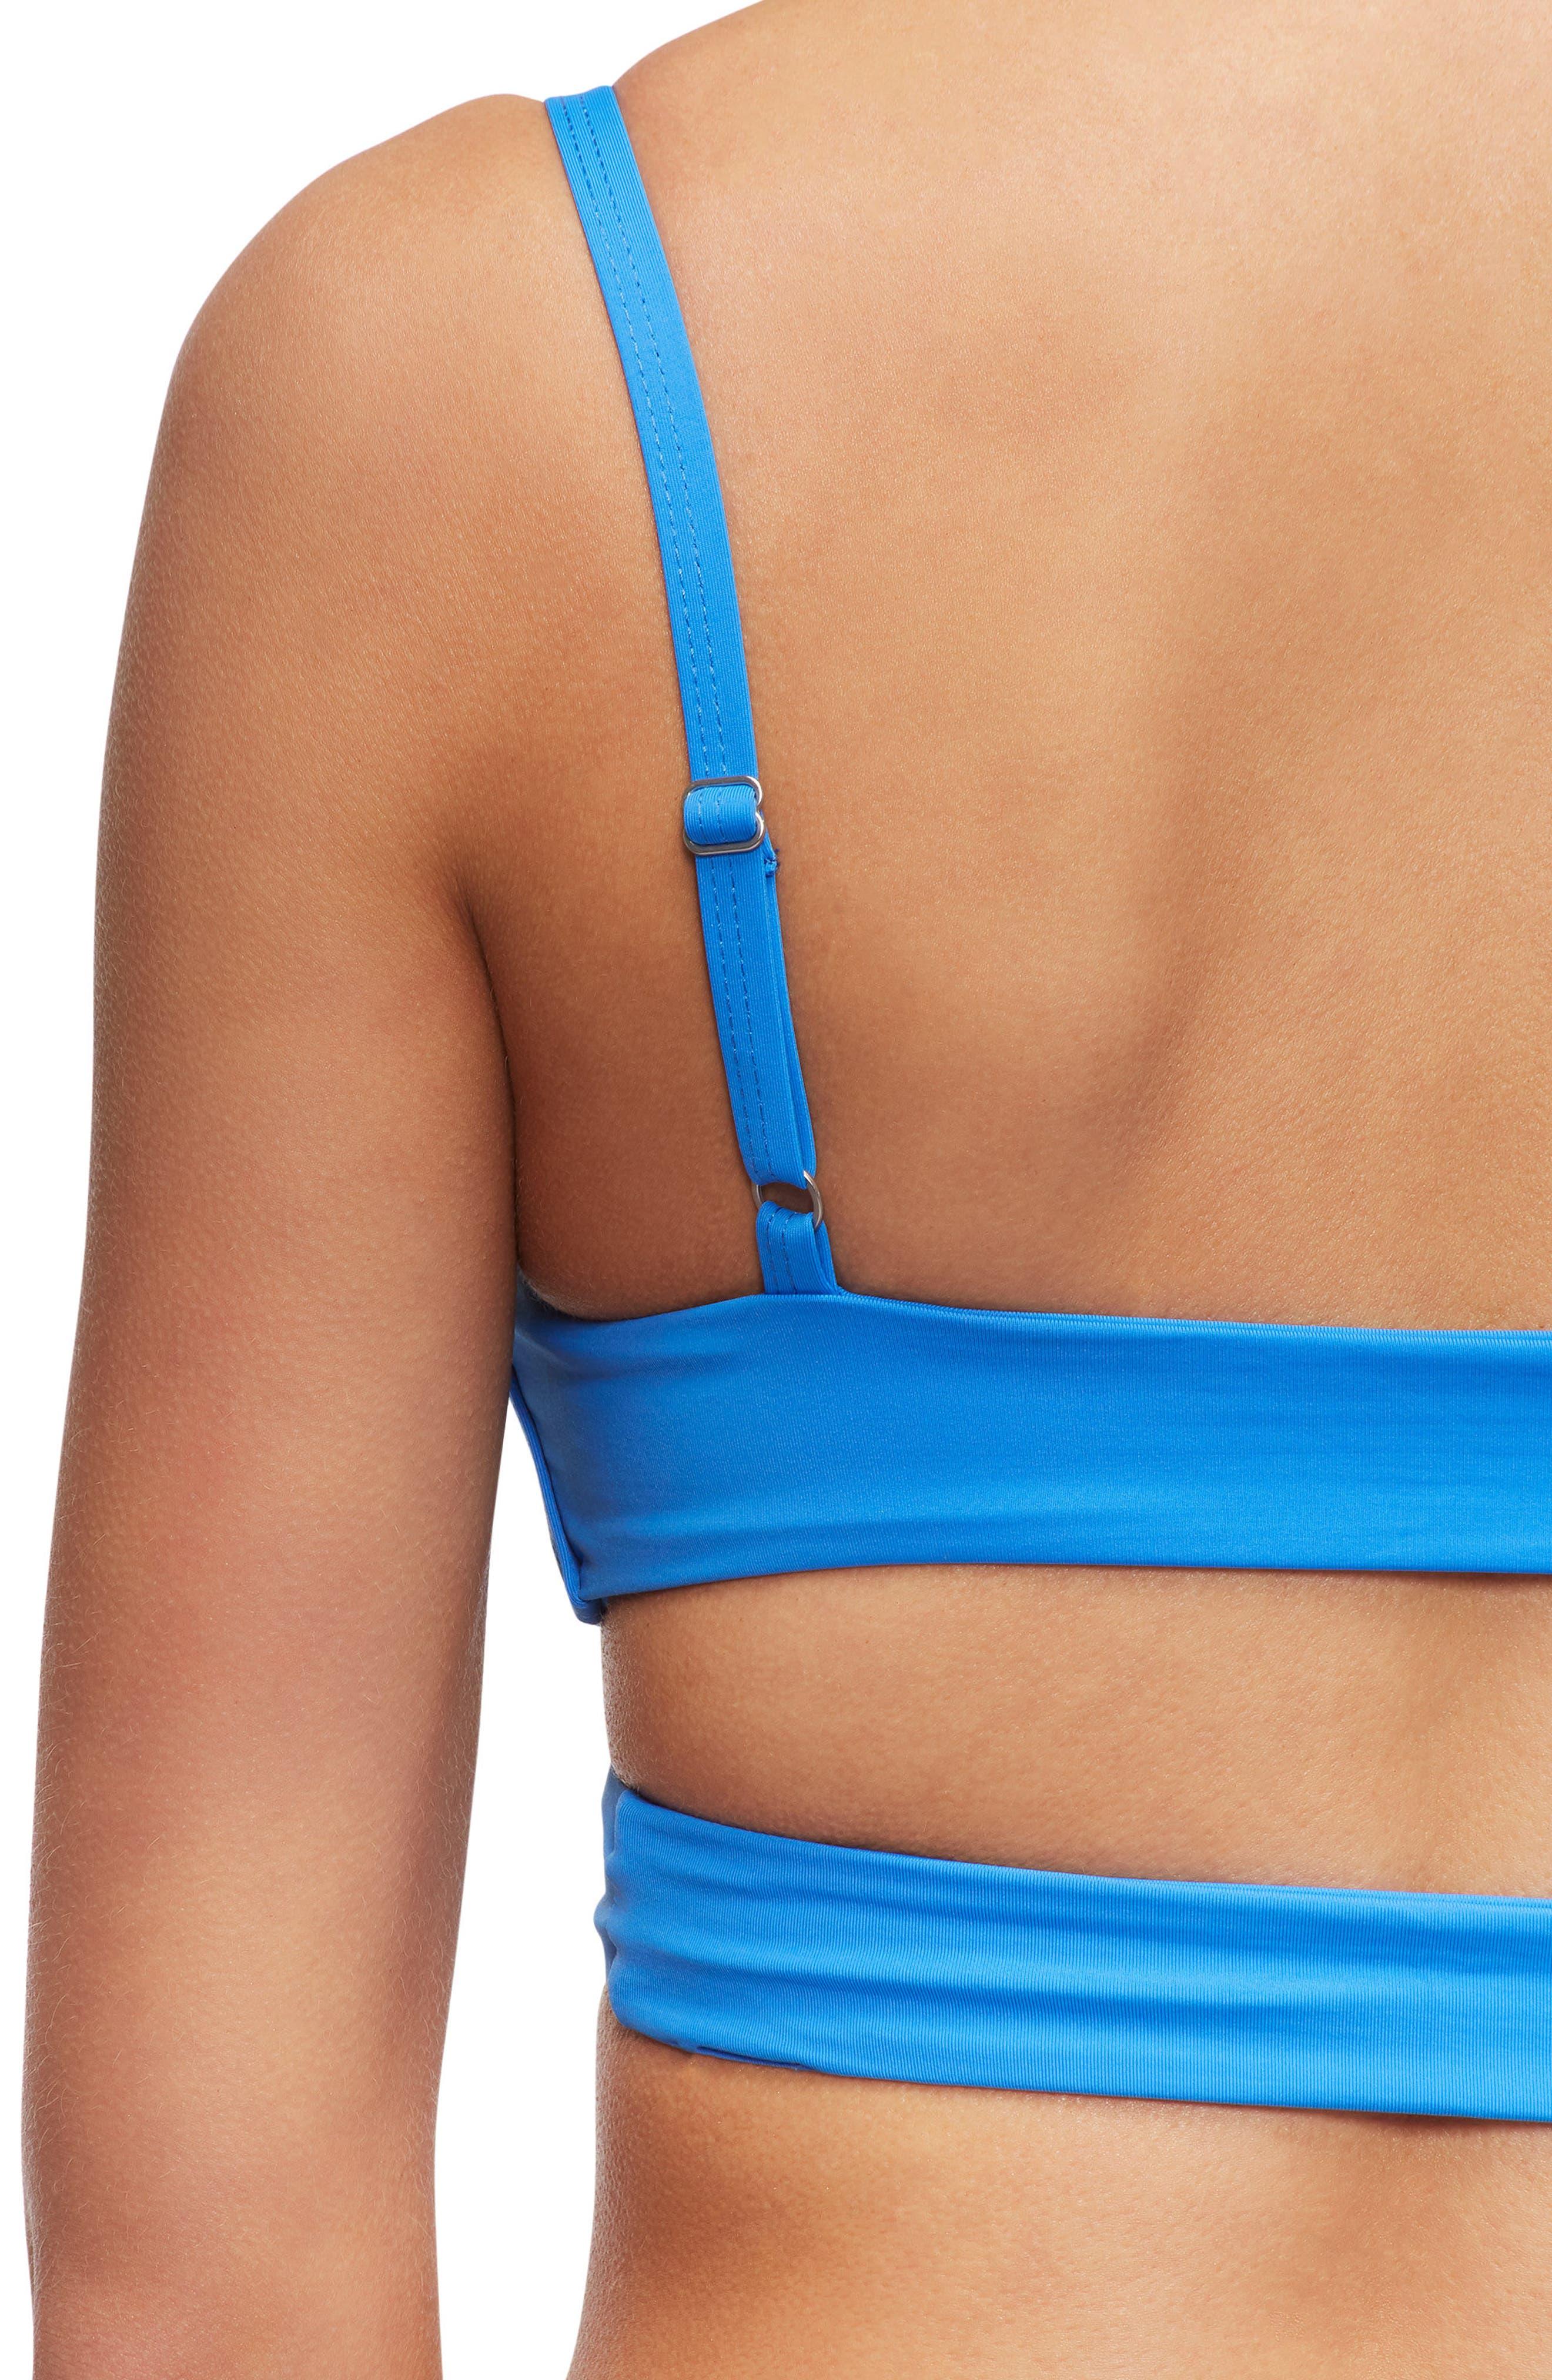 'Jessi' Cutout Triangle Bikini Top,                             Alternate thumbnail 5, color,                             FRENCH BLUE